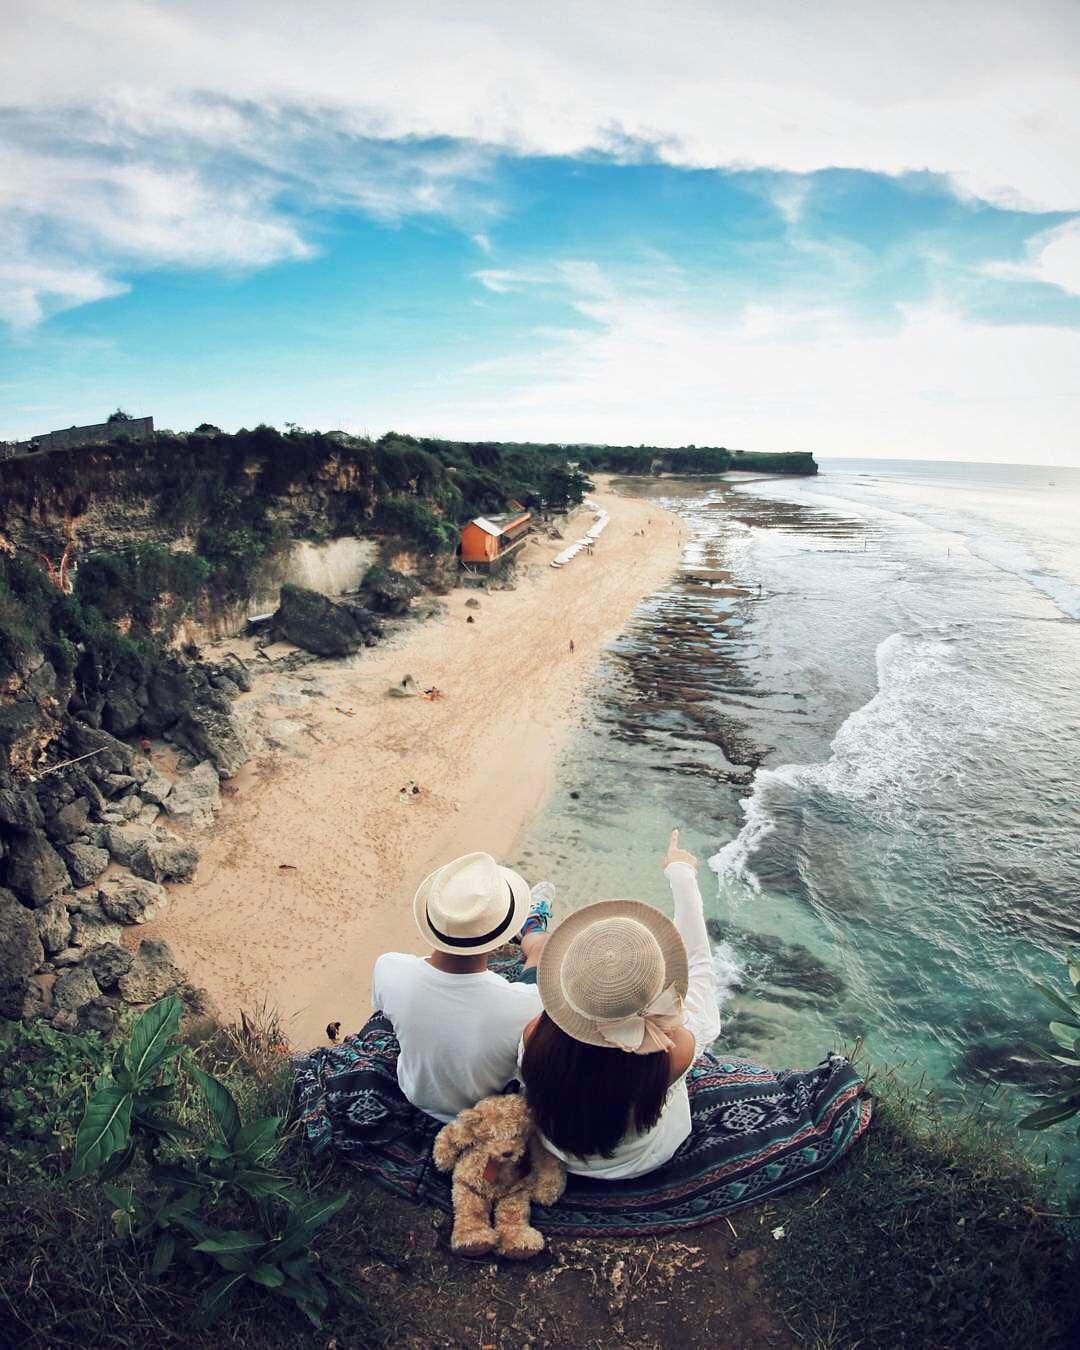 Tebing Pantai Balangan Badung Bali Tebing Pantai Balangan Pecatu by Gerry Norris Dolaners - Dolan Dolen